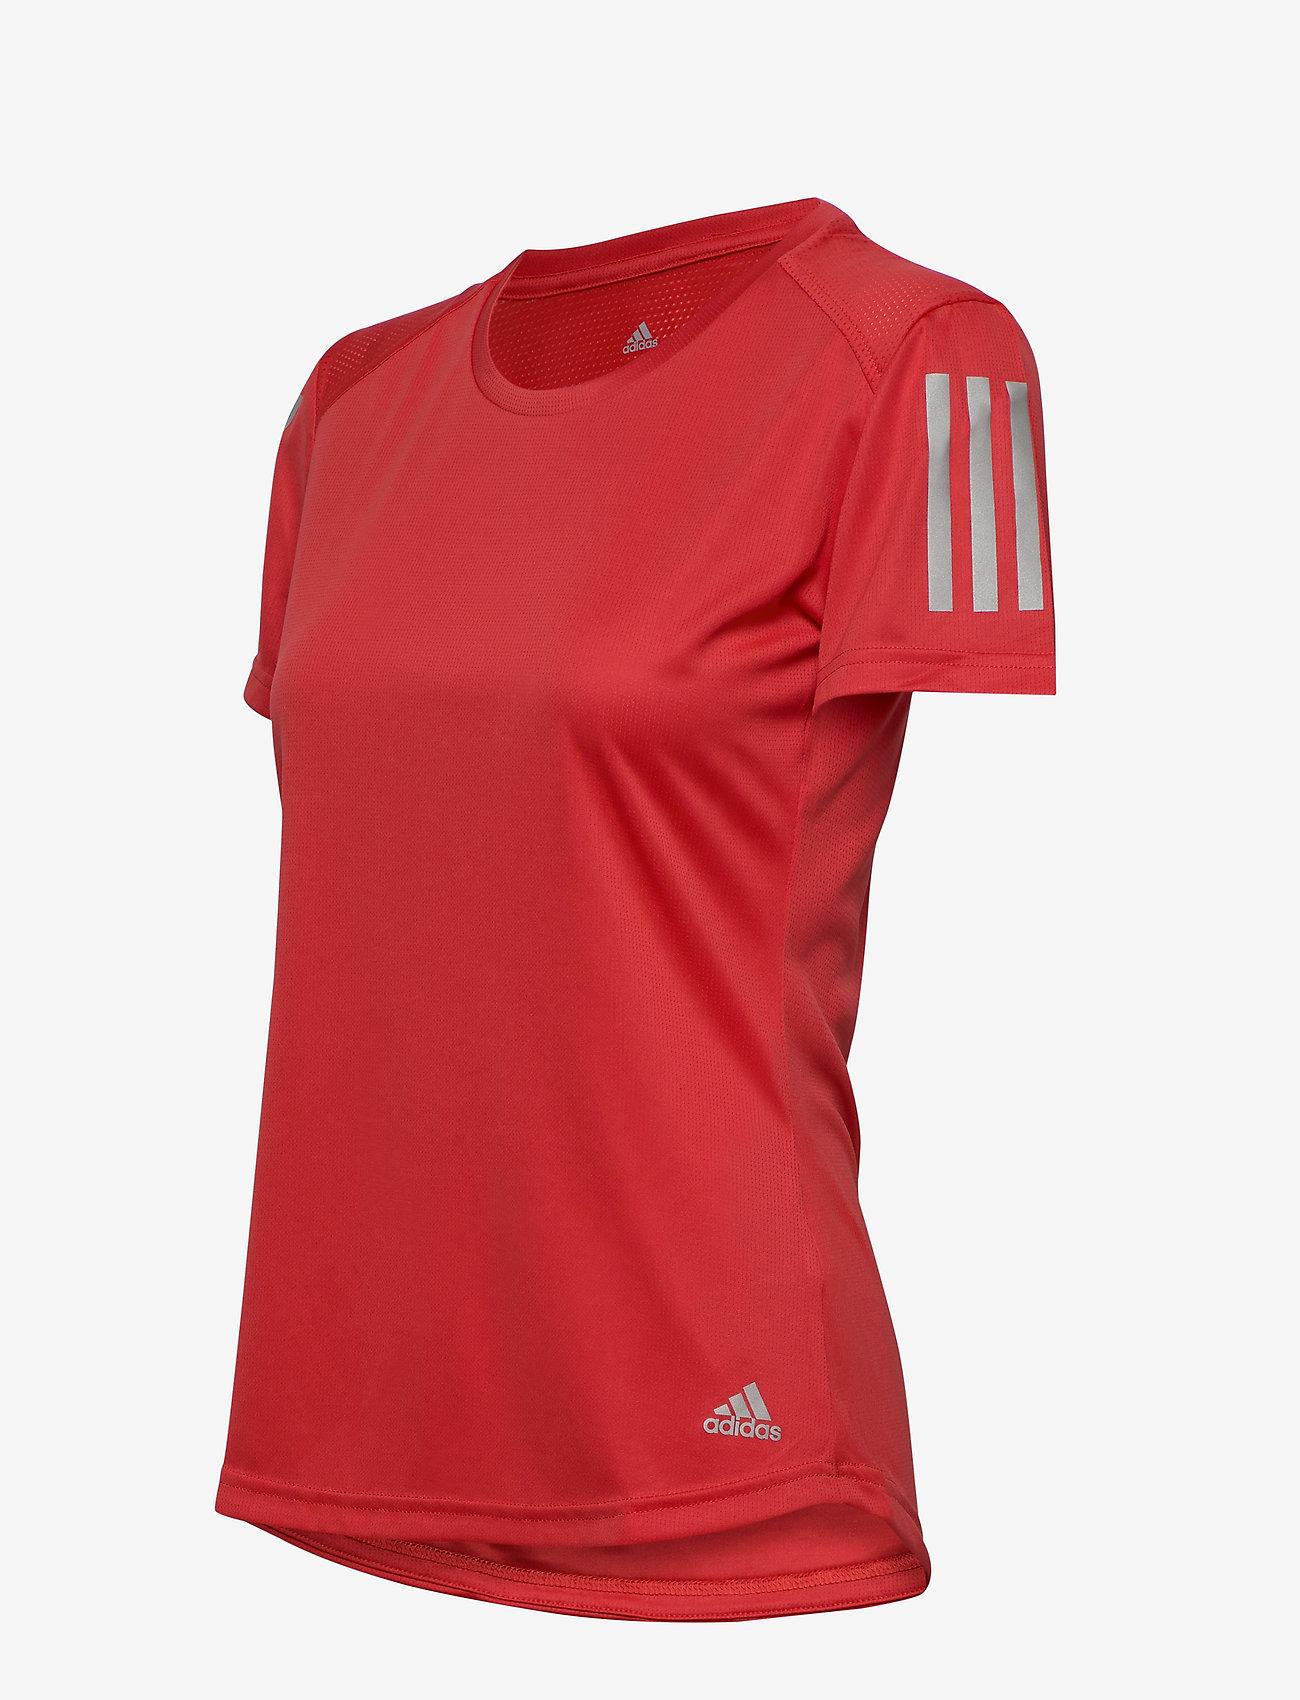 Own The Run Tee (Glored) (209.30 kr) - adidas Performance